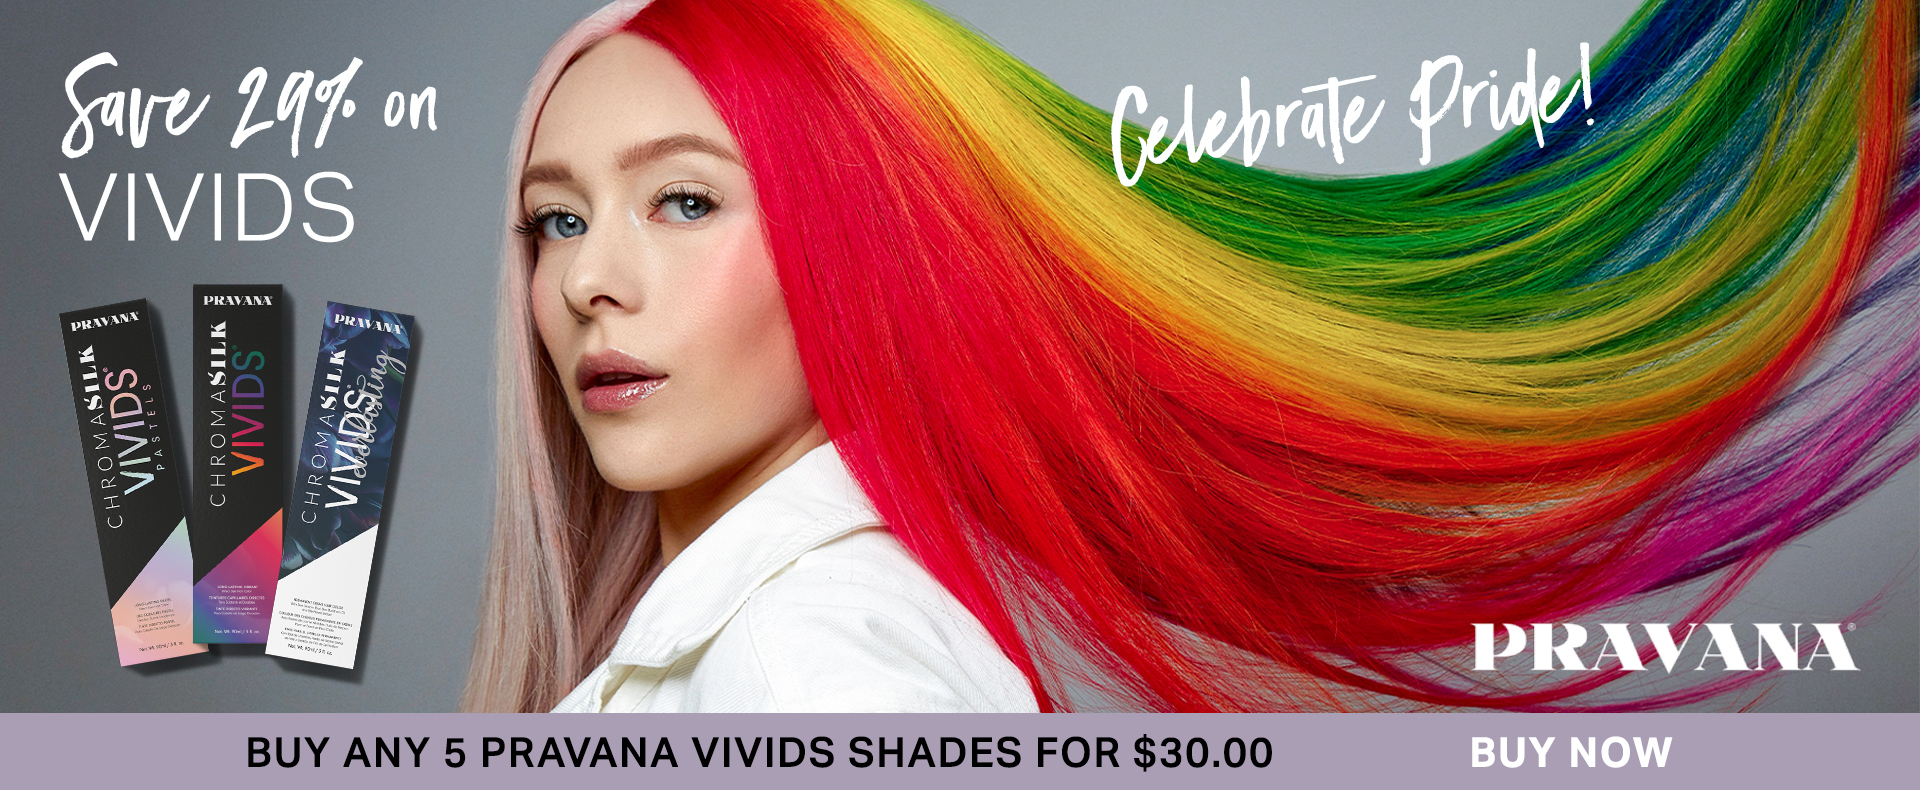 Pravana Vivids 5 for $30